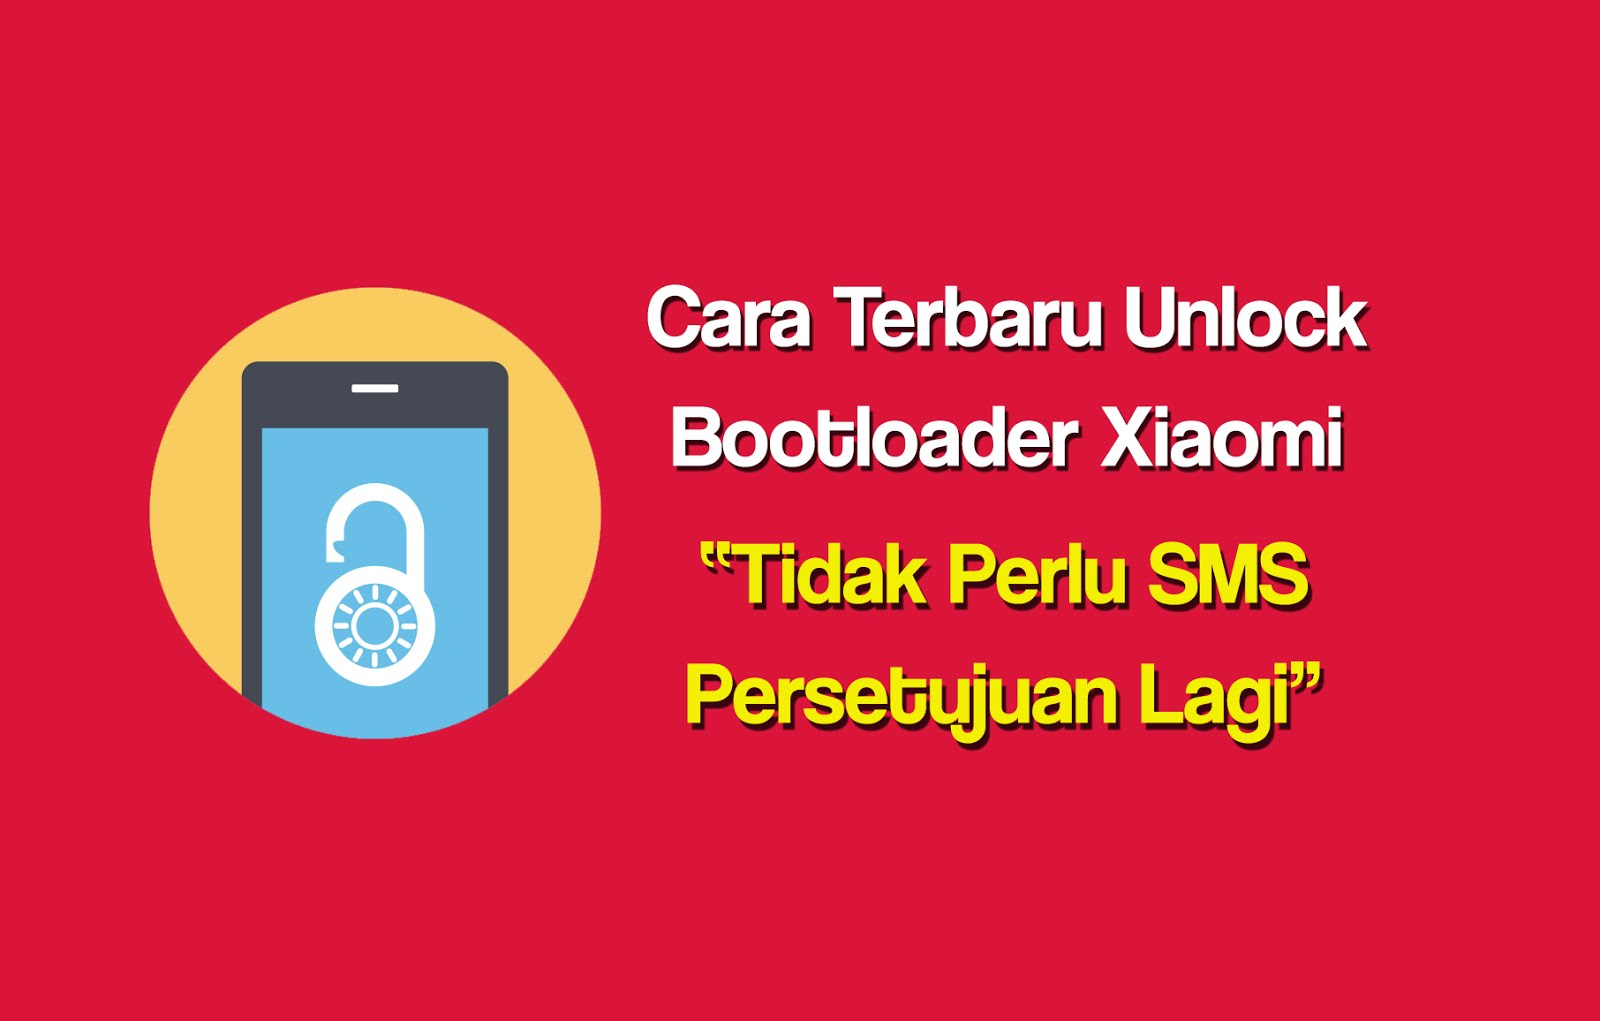 Cara Terbaru Unlock Bootloader Xiaomi